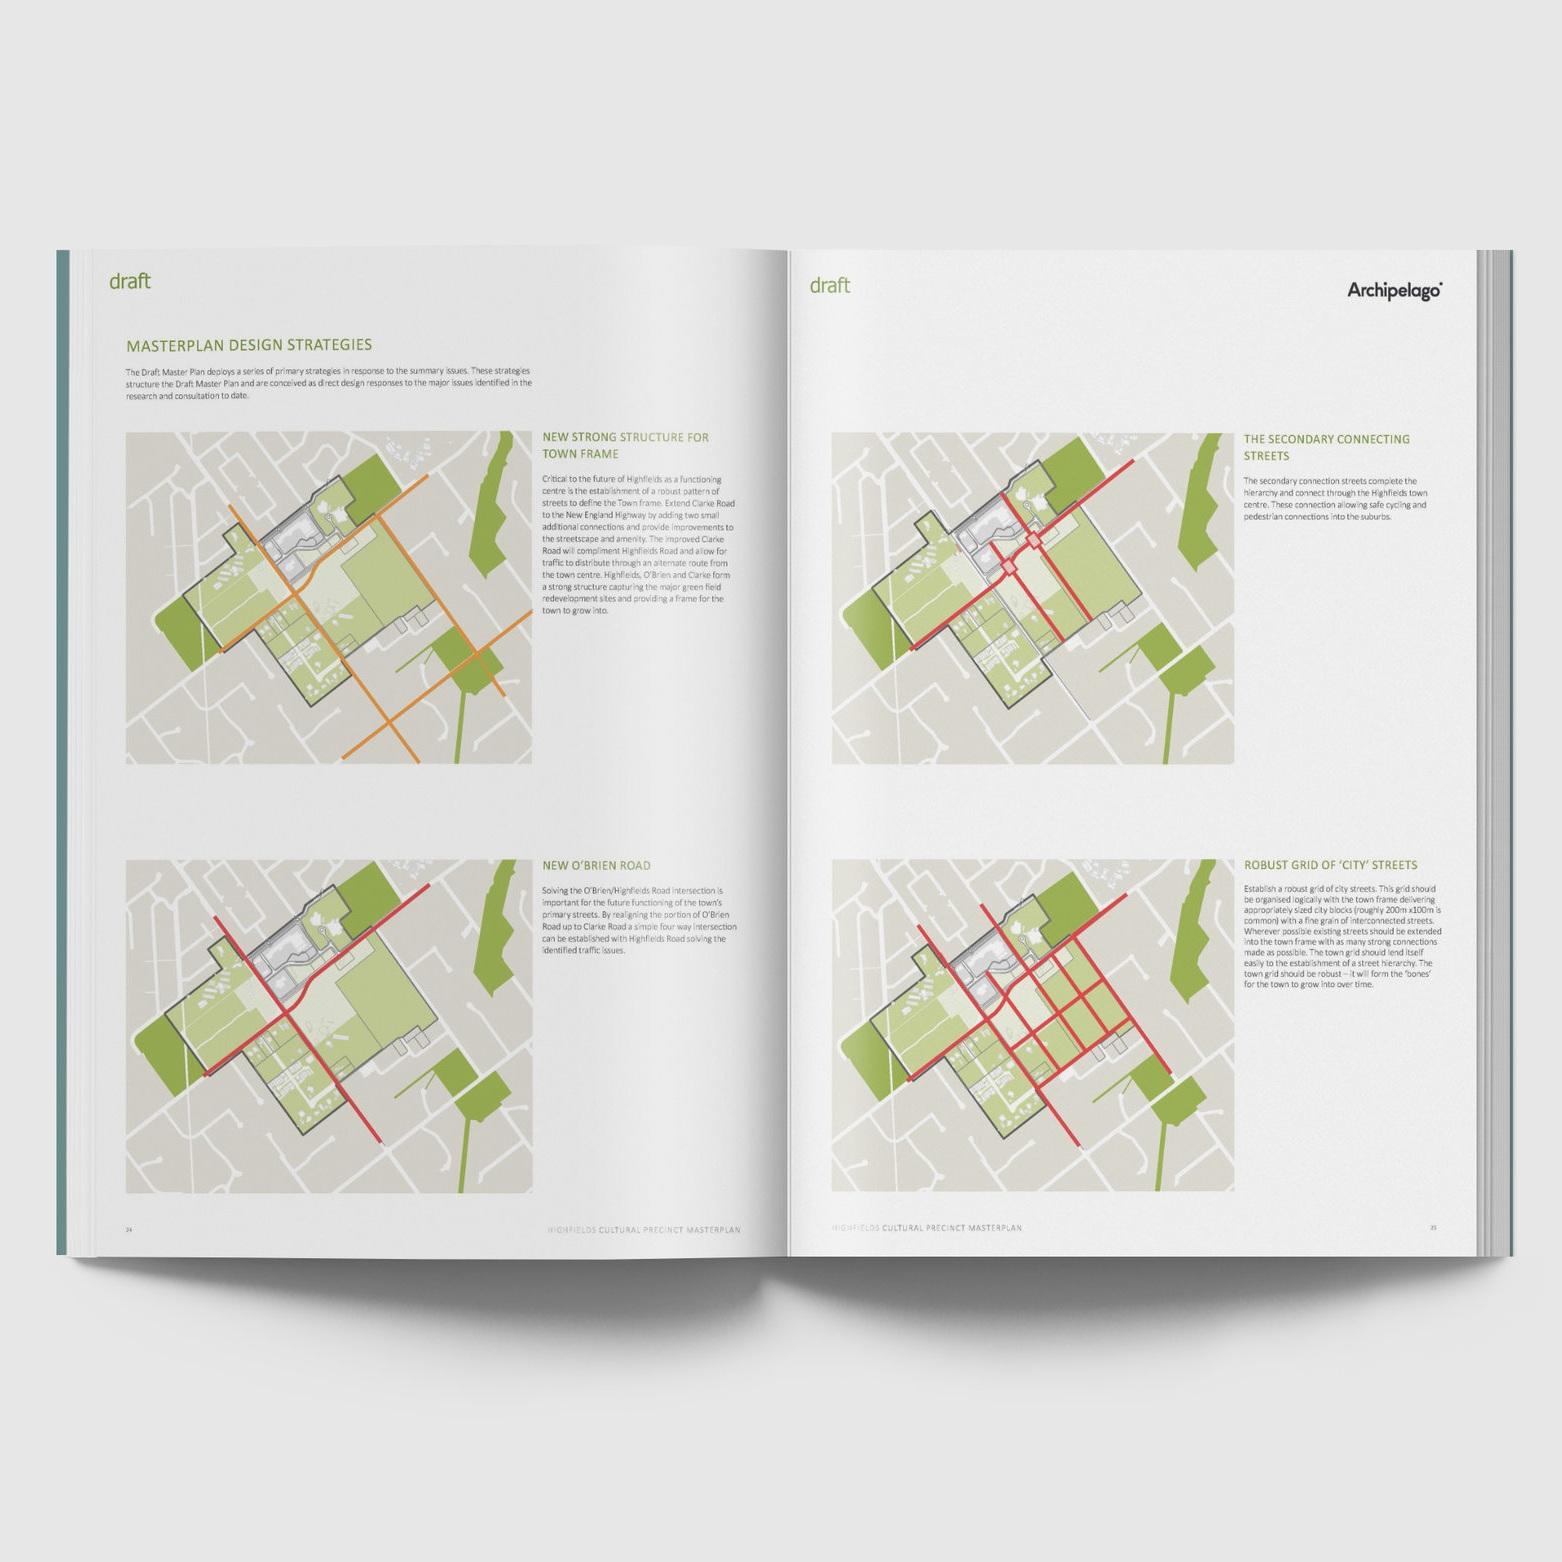 Urban+Design+Strategies+1.jpg